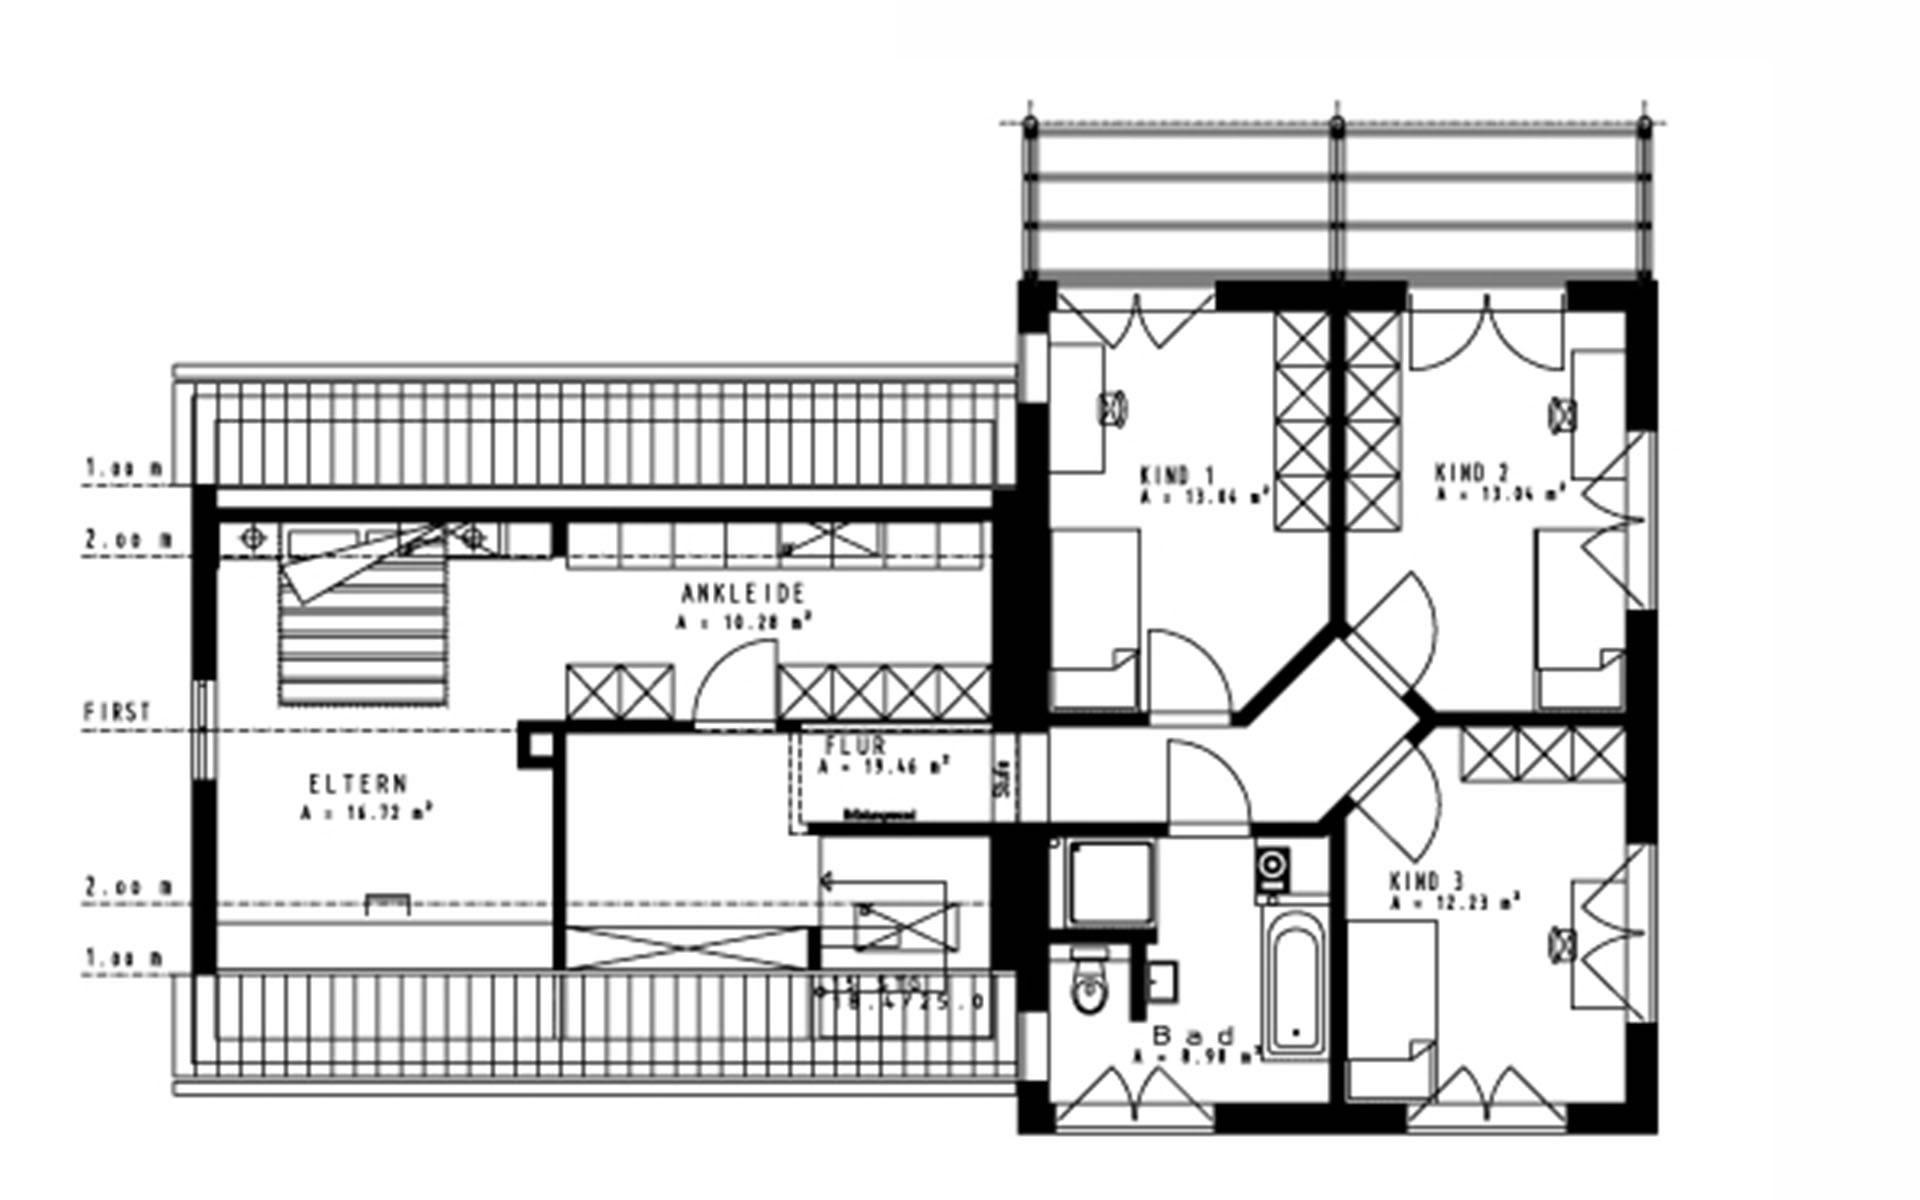 Obergeschoss Mangold von Sonnleitner Holzbauwerke GmbH & Co. KG